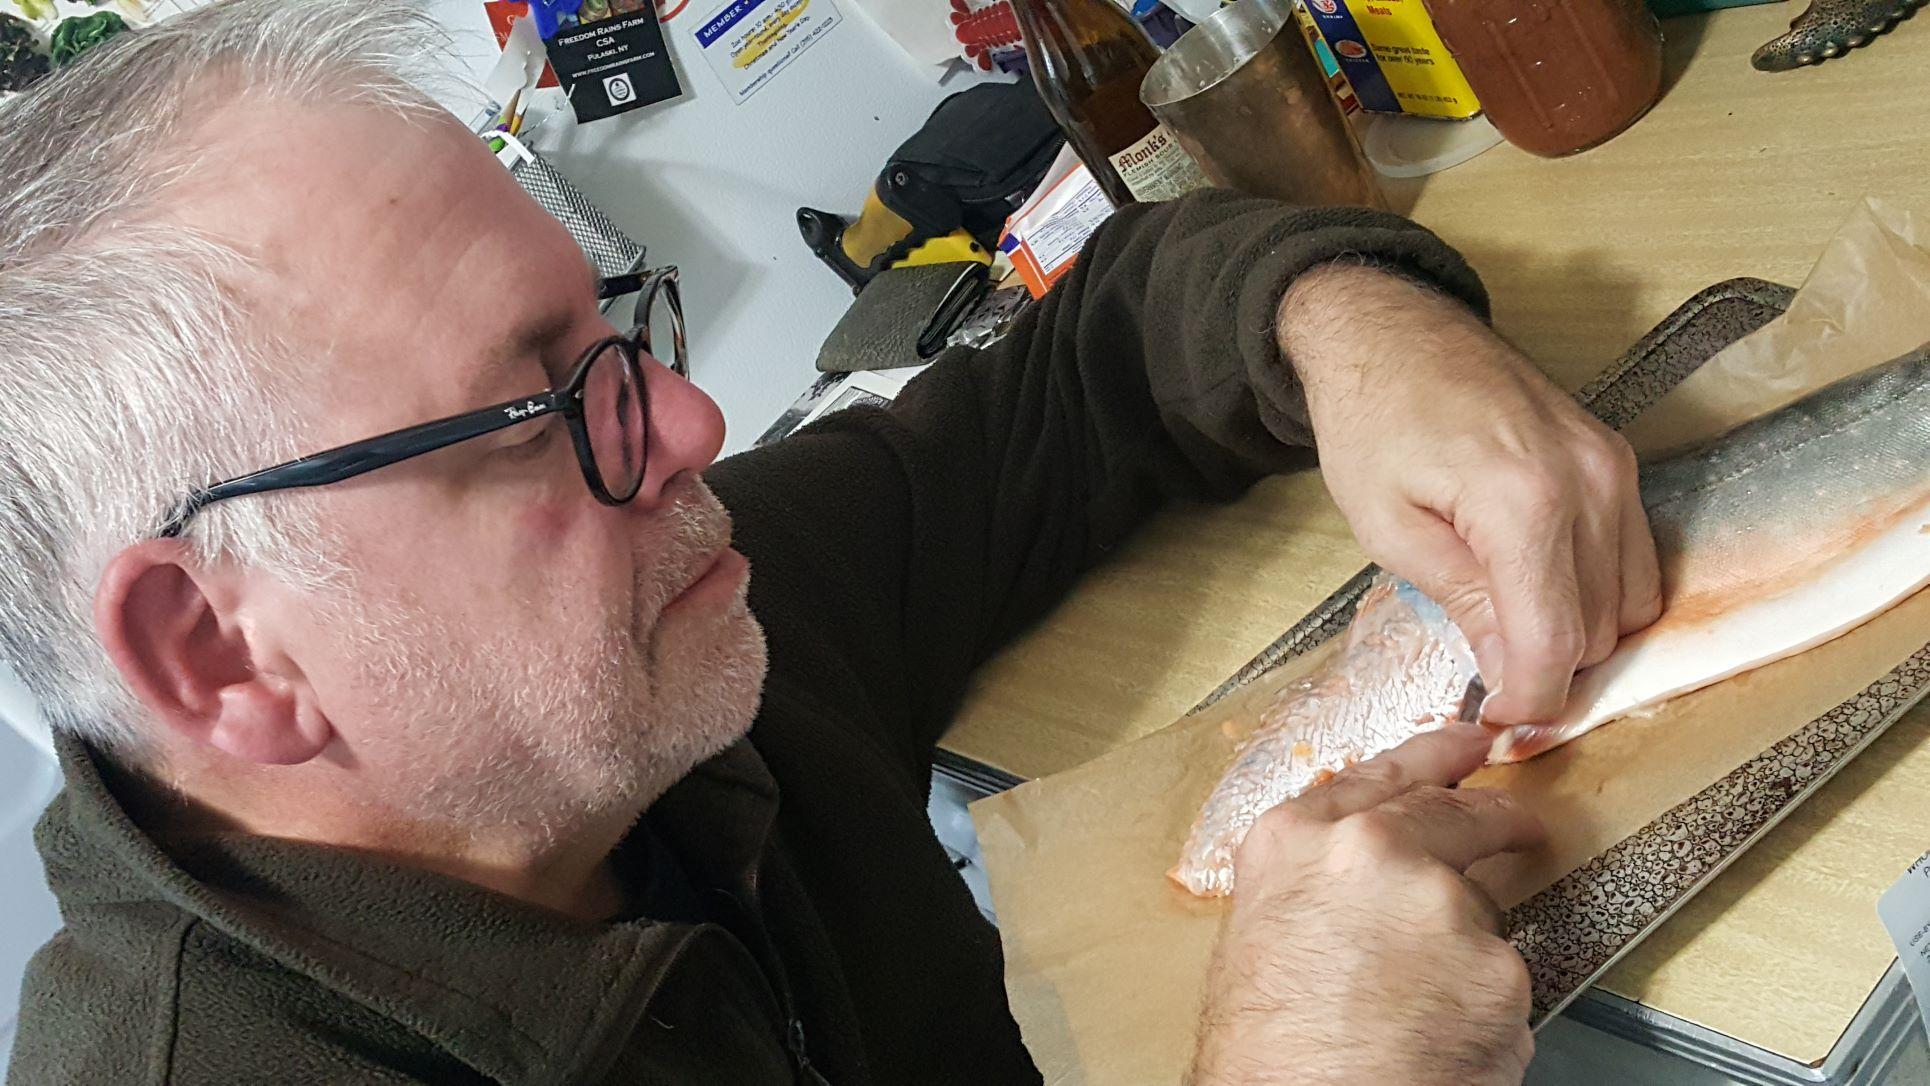 Peter Verheyen works on a bookbinding project.